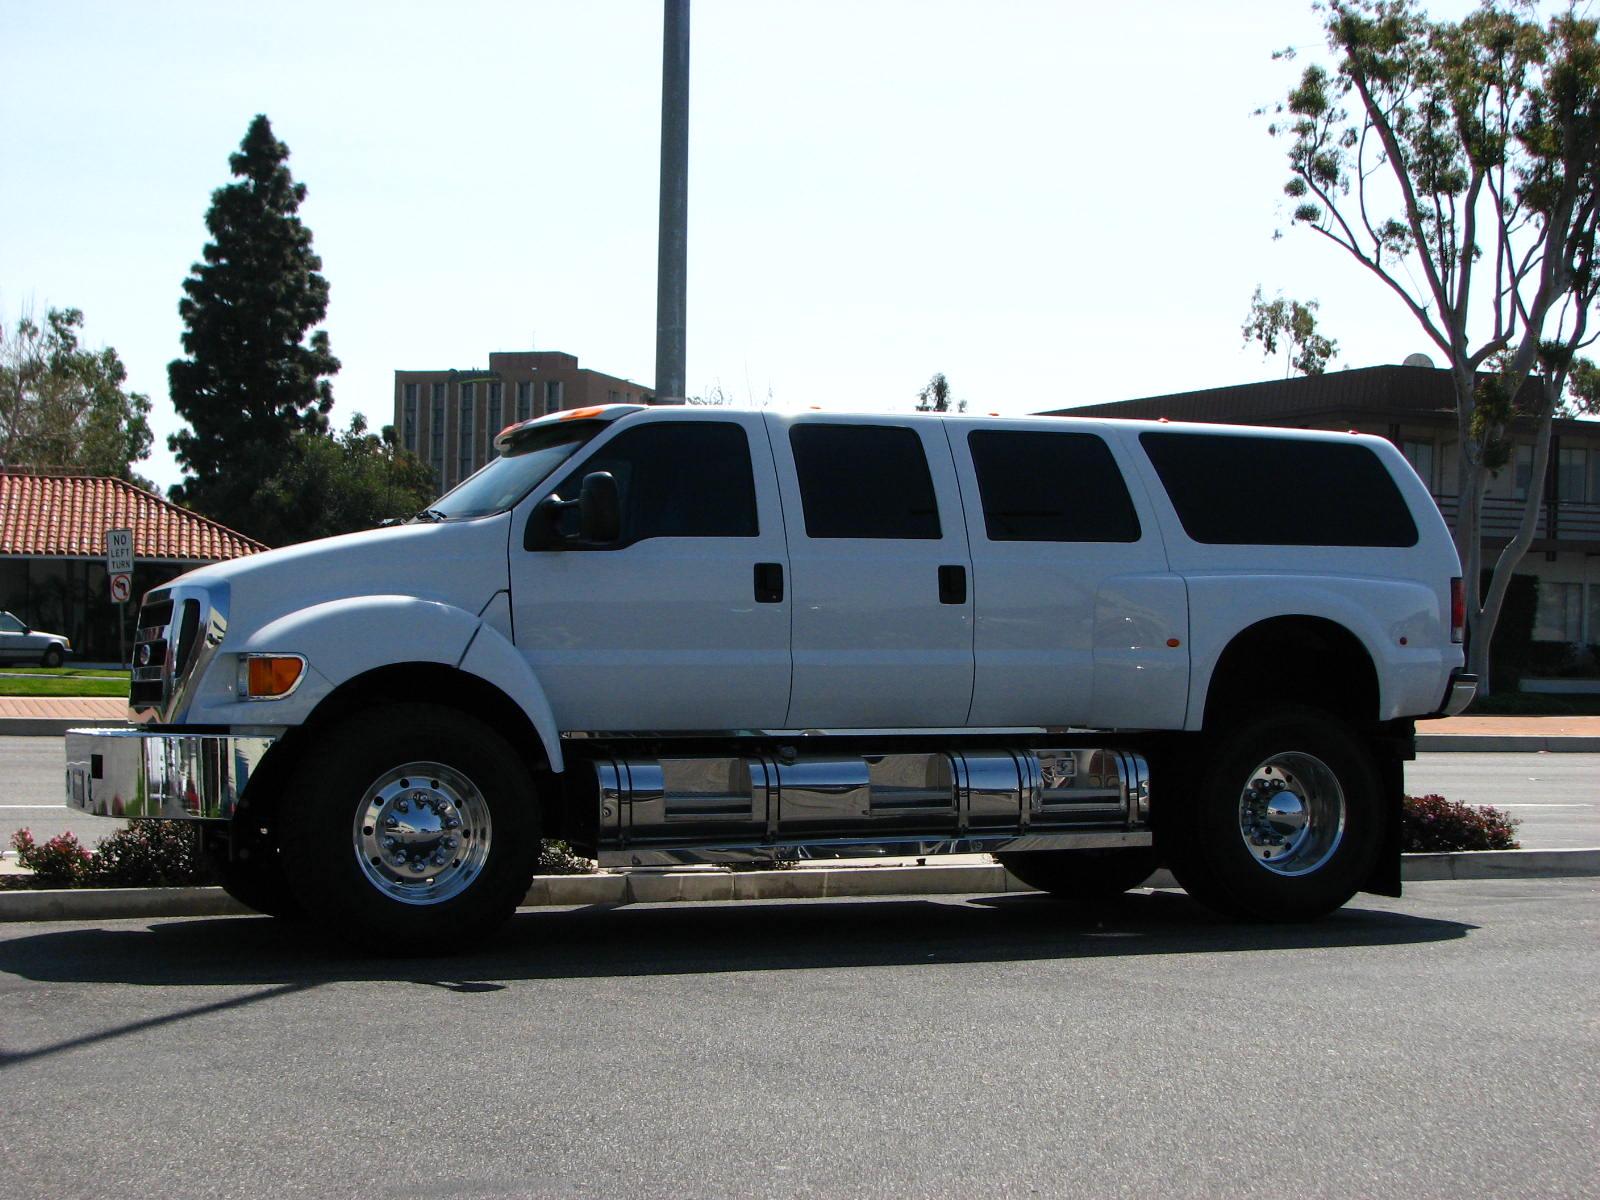 Description Ford F650 4X4 Truck - Flickr - Highway Patrol Images.jpg